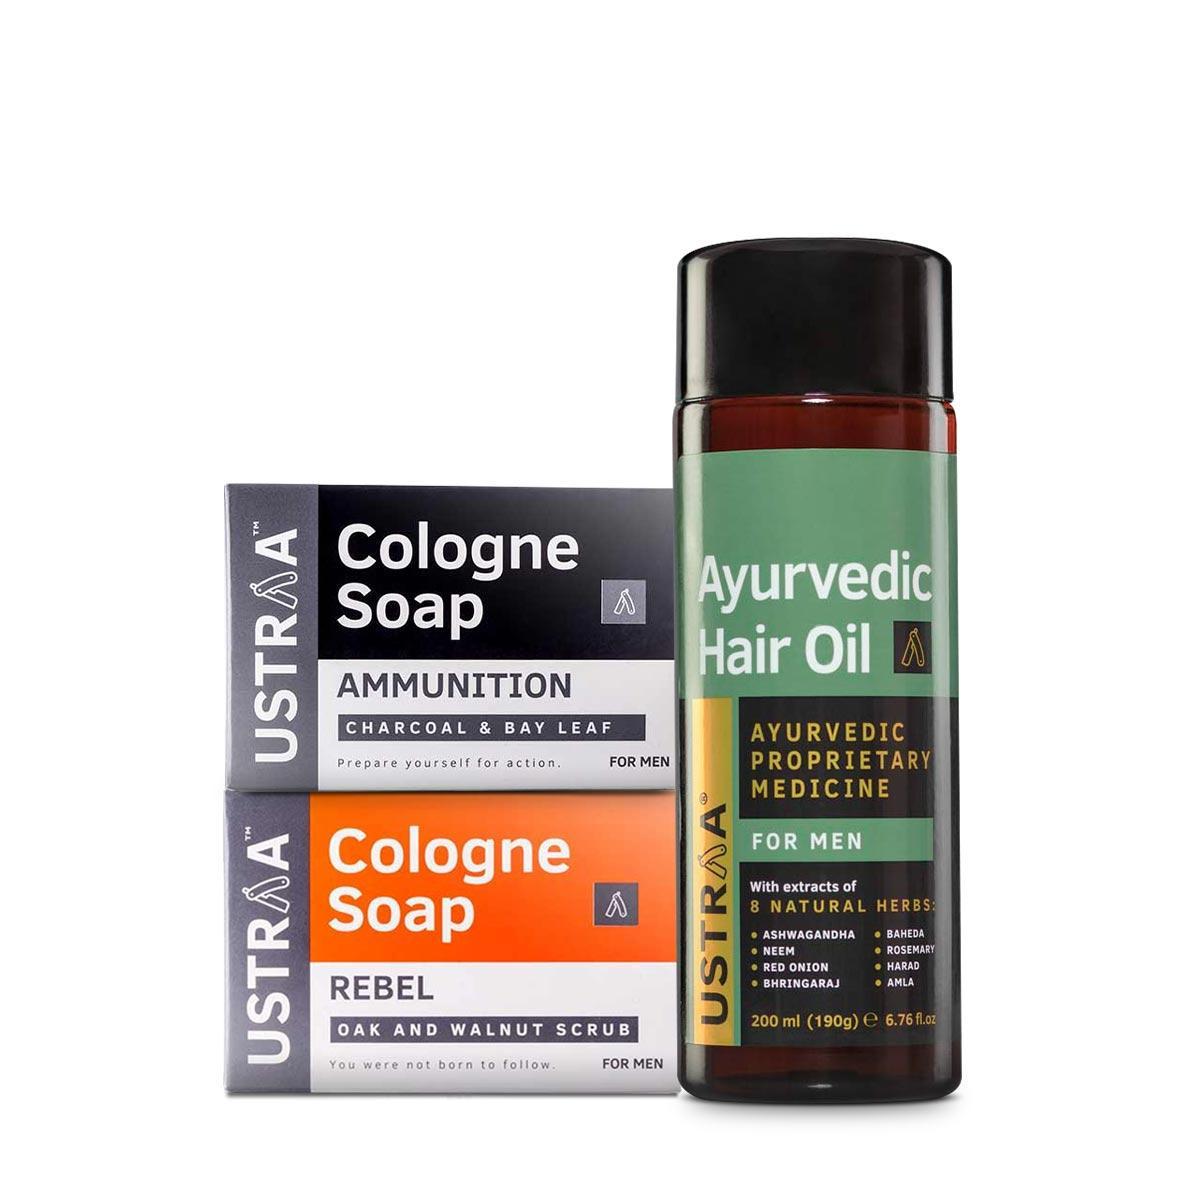 Ayurvedic Hair Oil & Cologne Soaps- Rebel & Ammunition